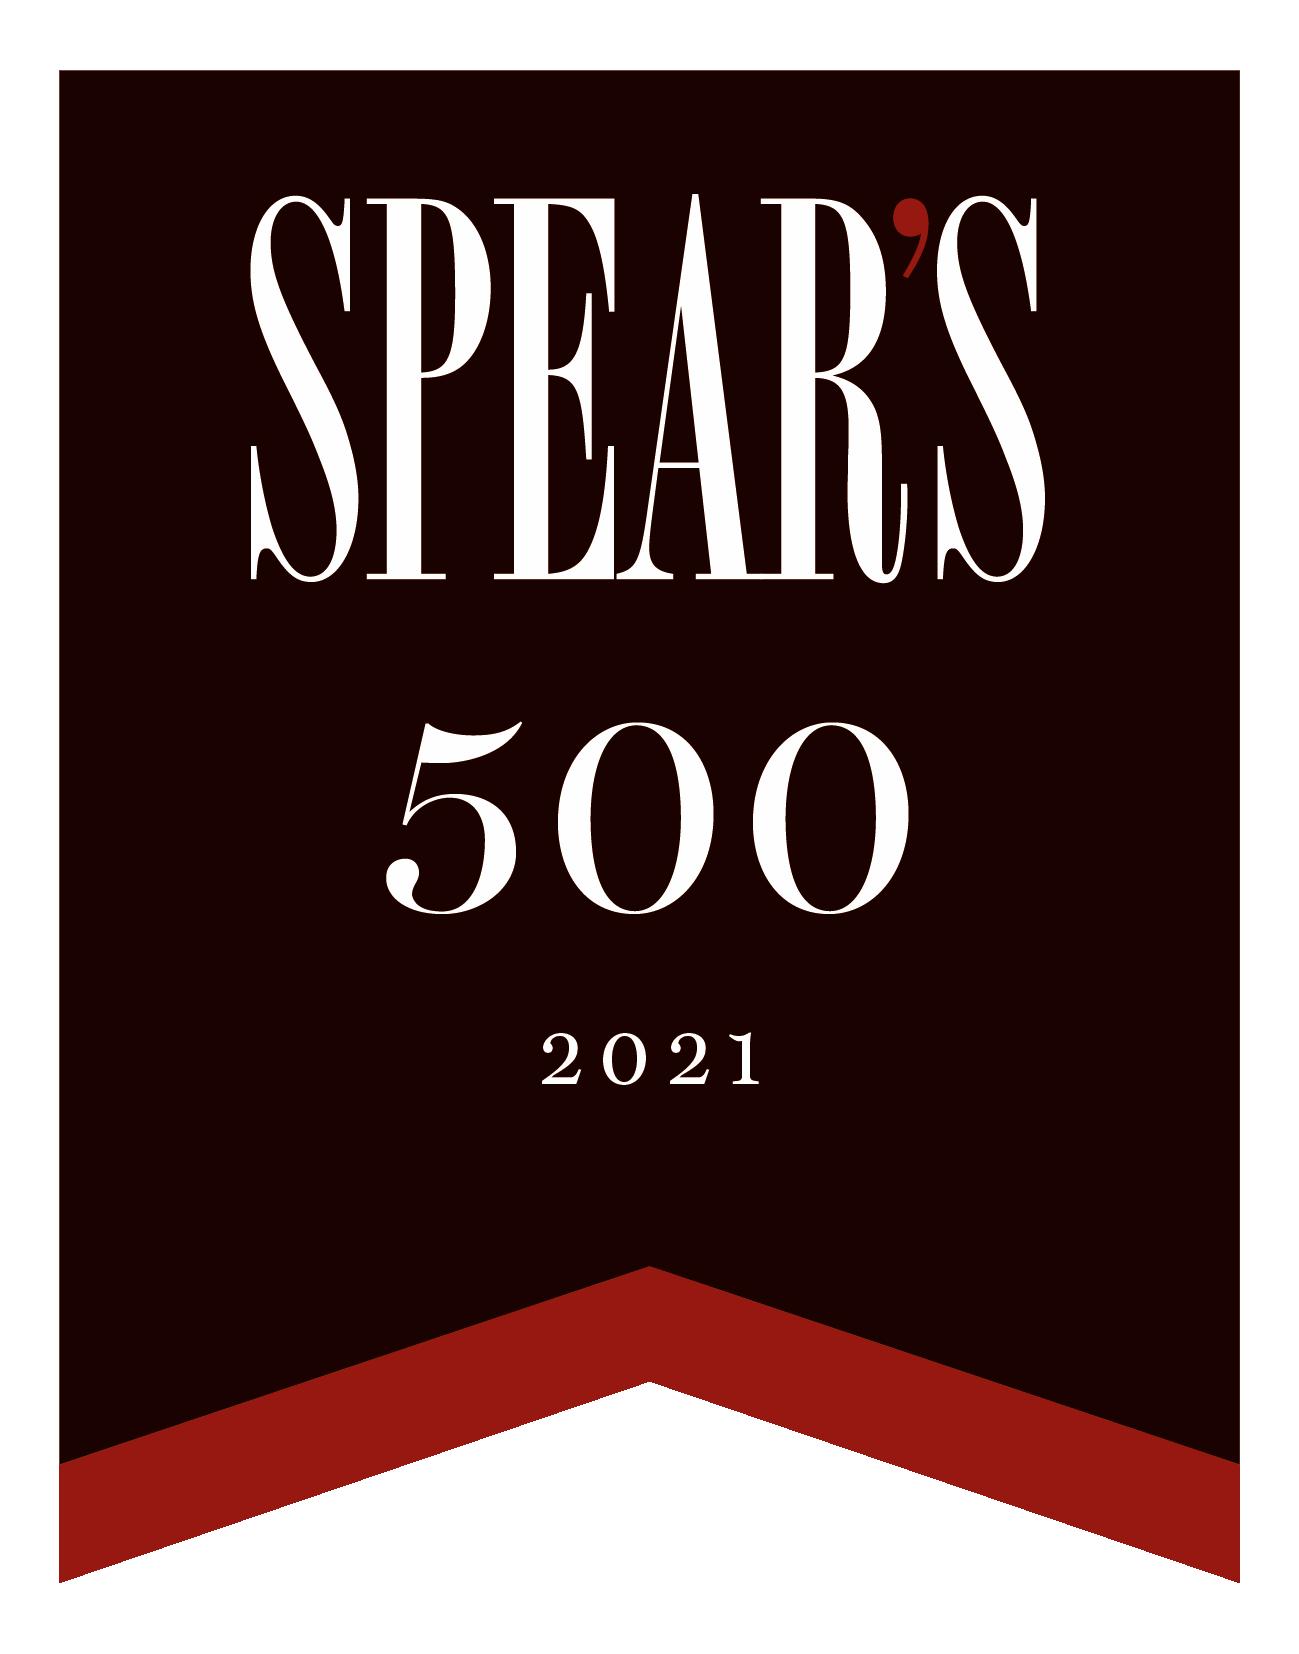 Spear's-500-2021-Ribbon